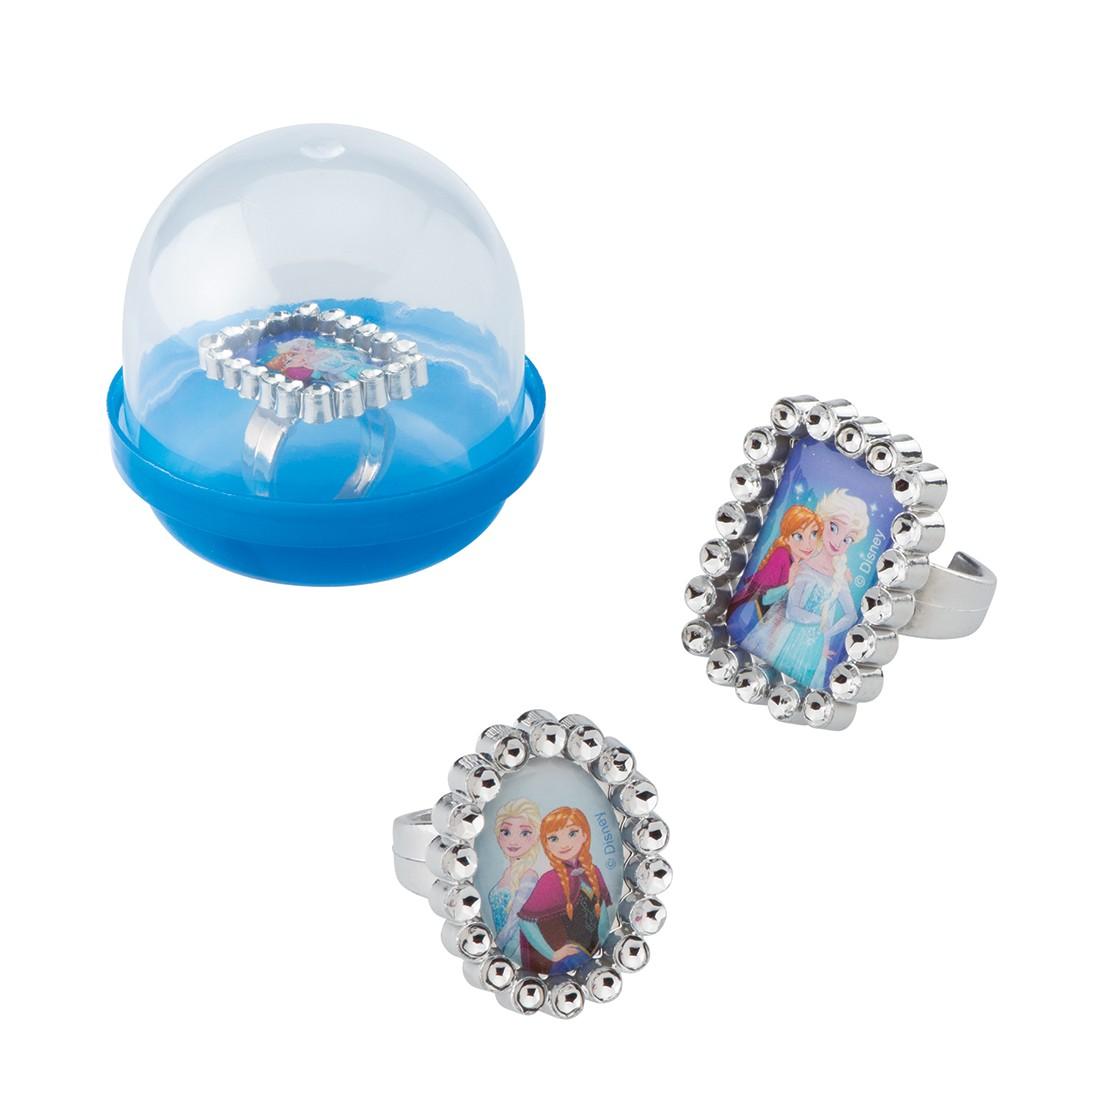 "Disney Frozen Jewel Rings in 2"" Capsules [image]"